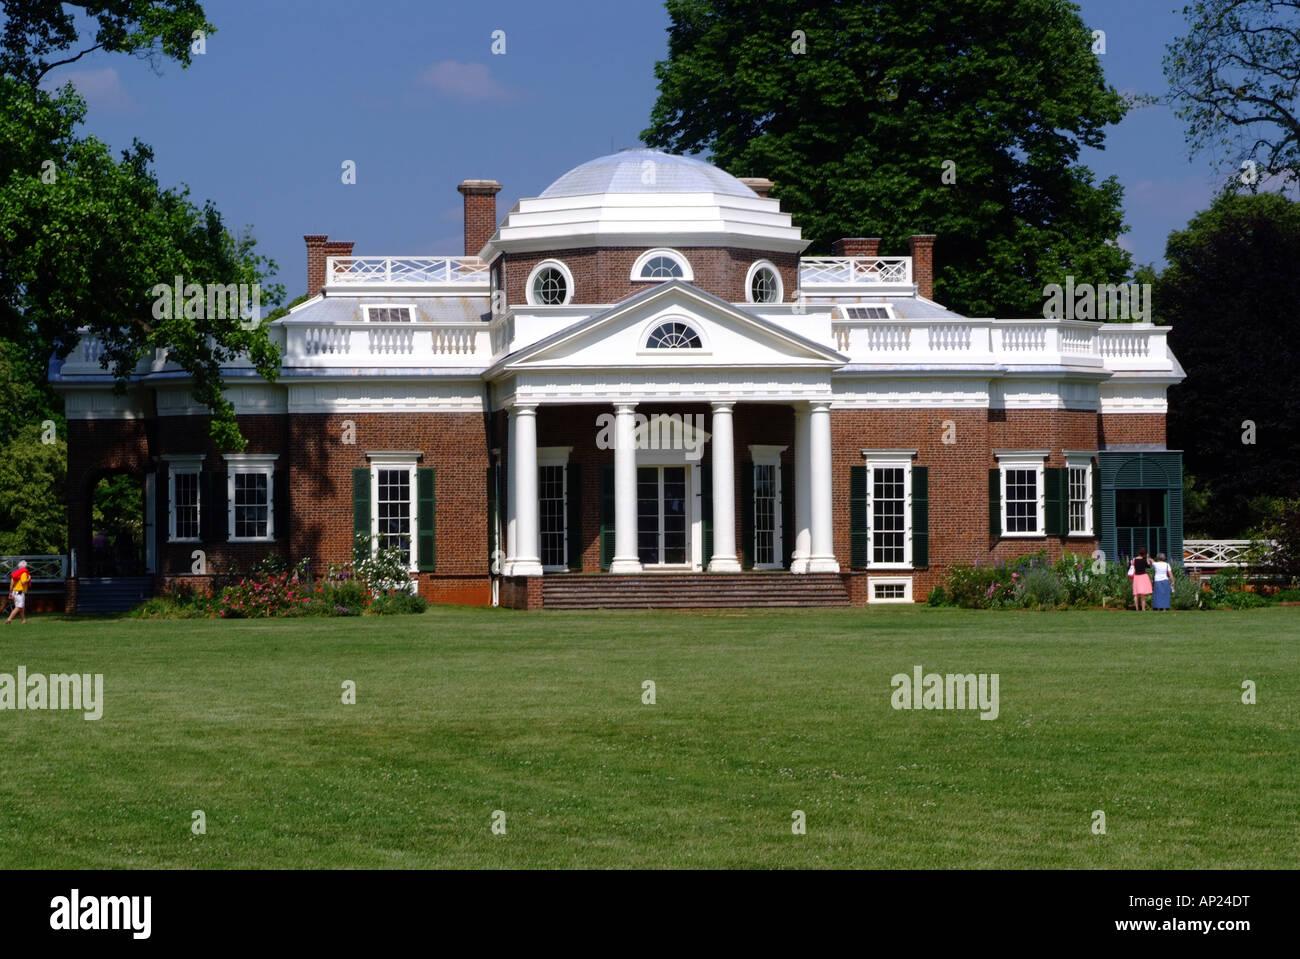 Images of America: Monticello